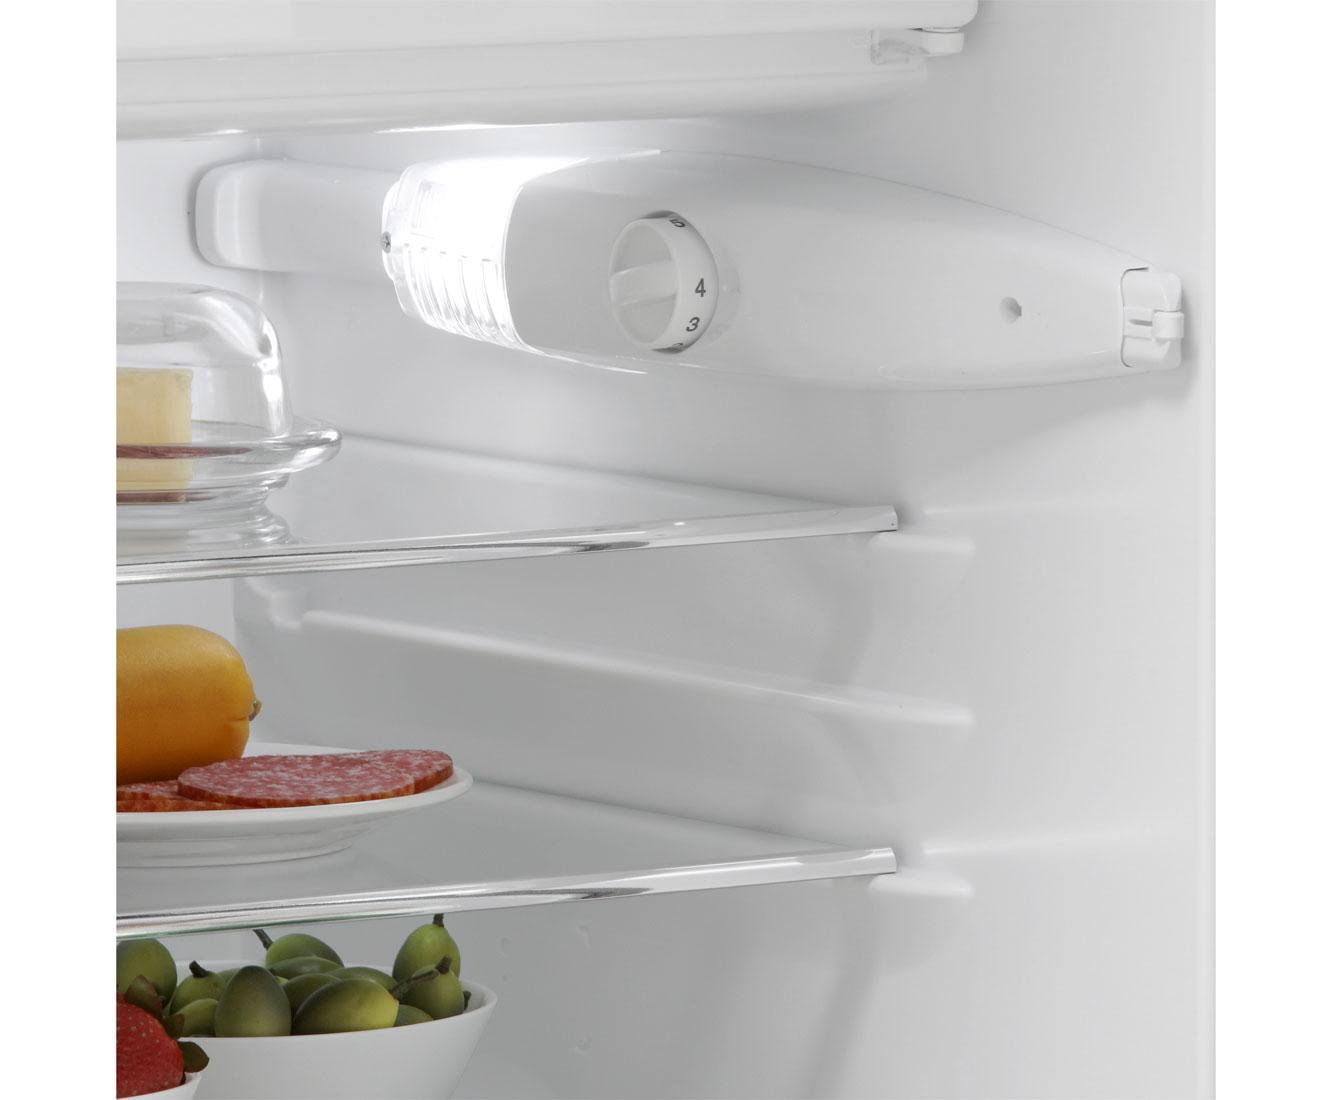 Aeg Kühlschrank Preis : Aeg santo rtb81421ax kühlschrank mit gefrierfach edelstahl a